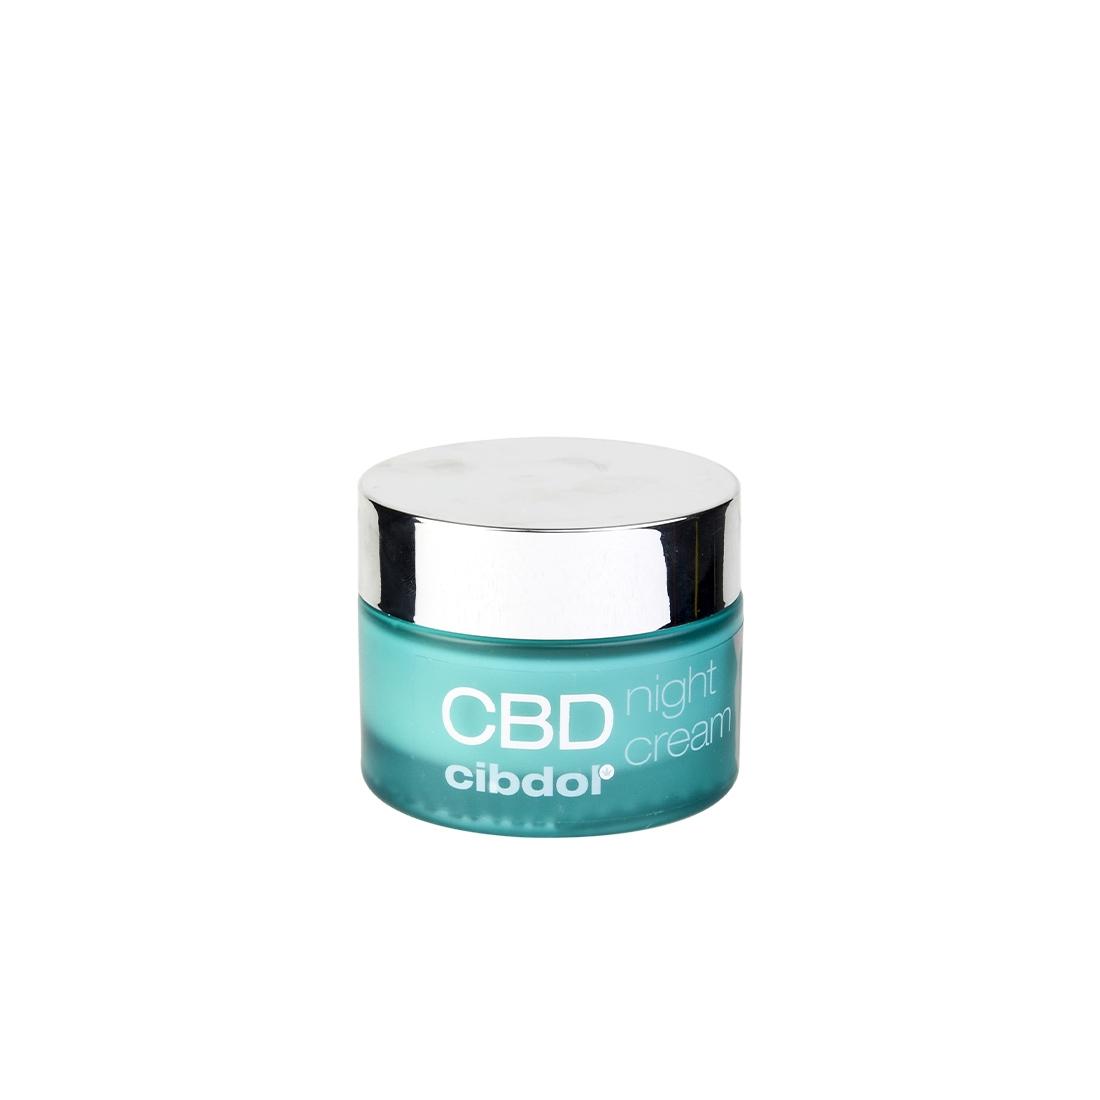 Creme CBD Cibdol Night Cream